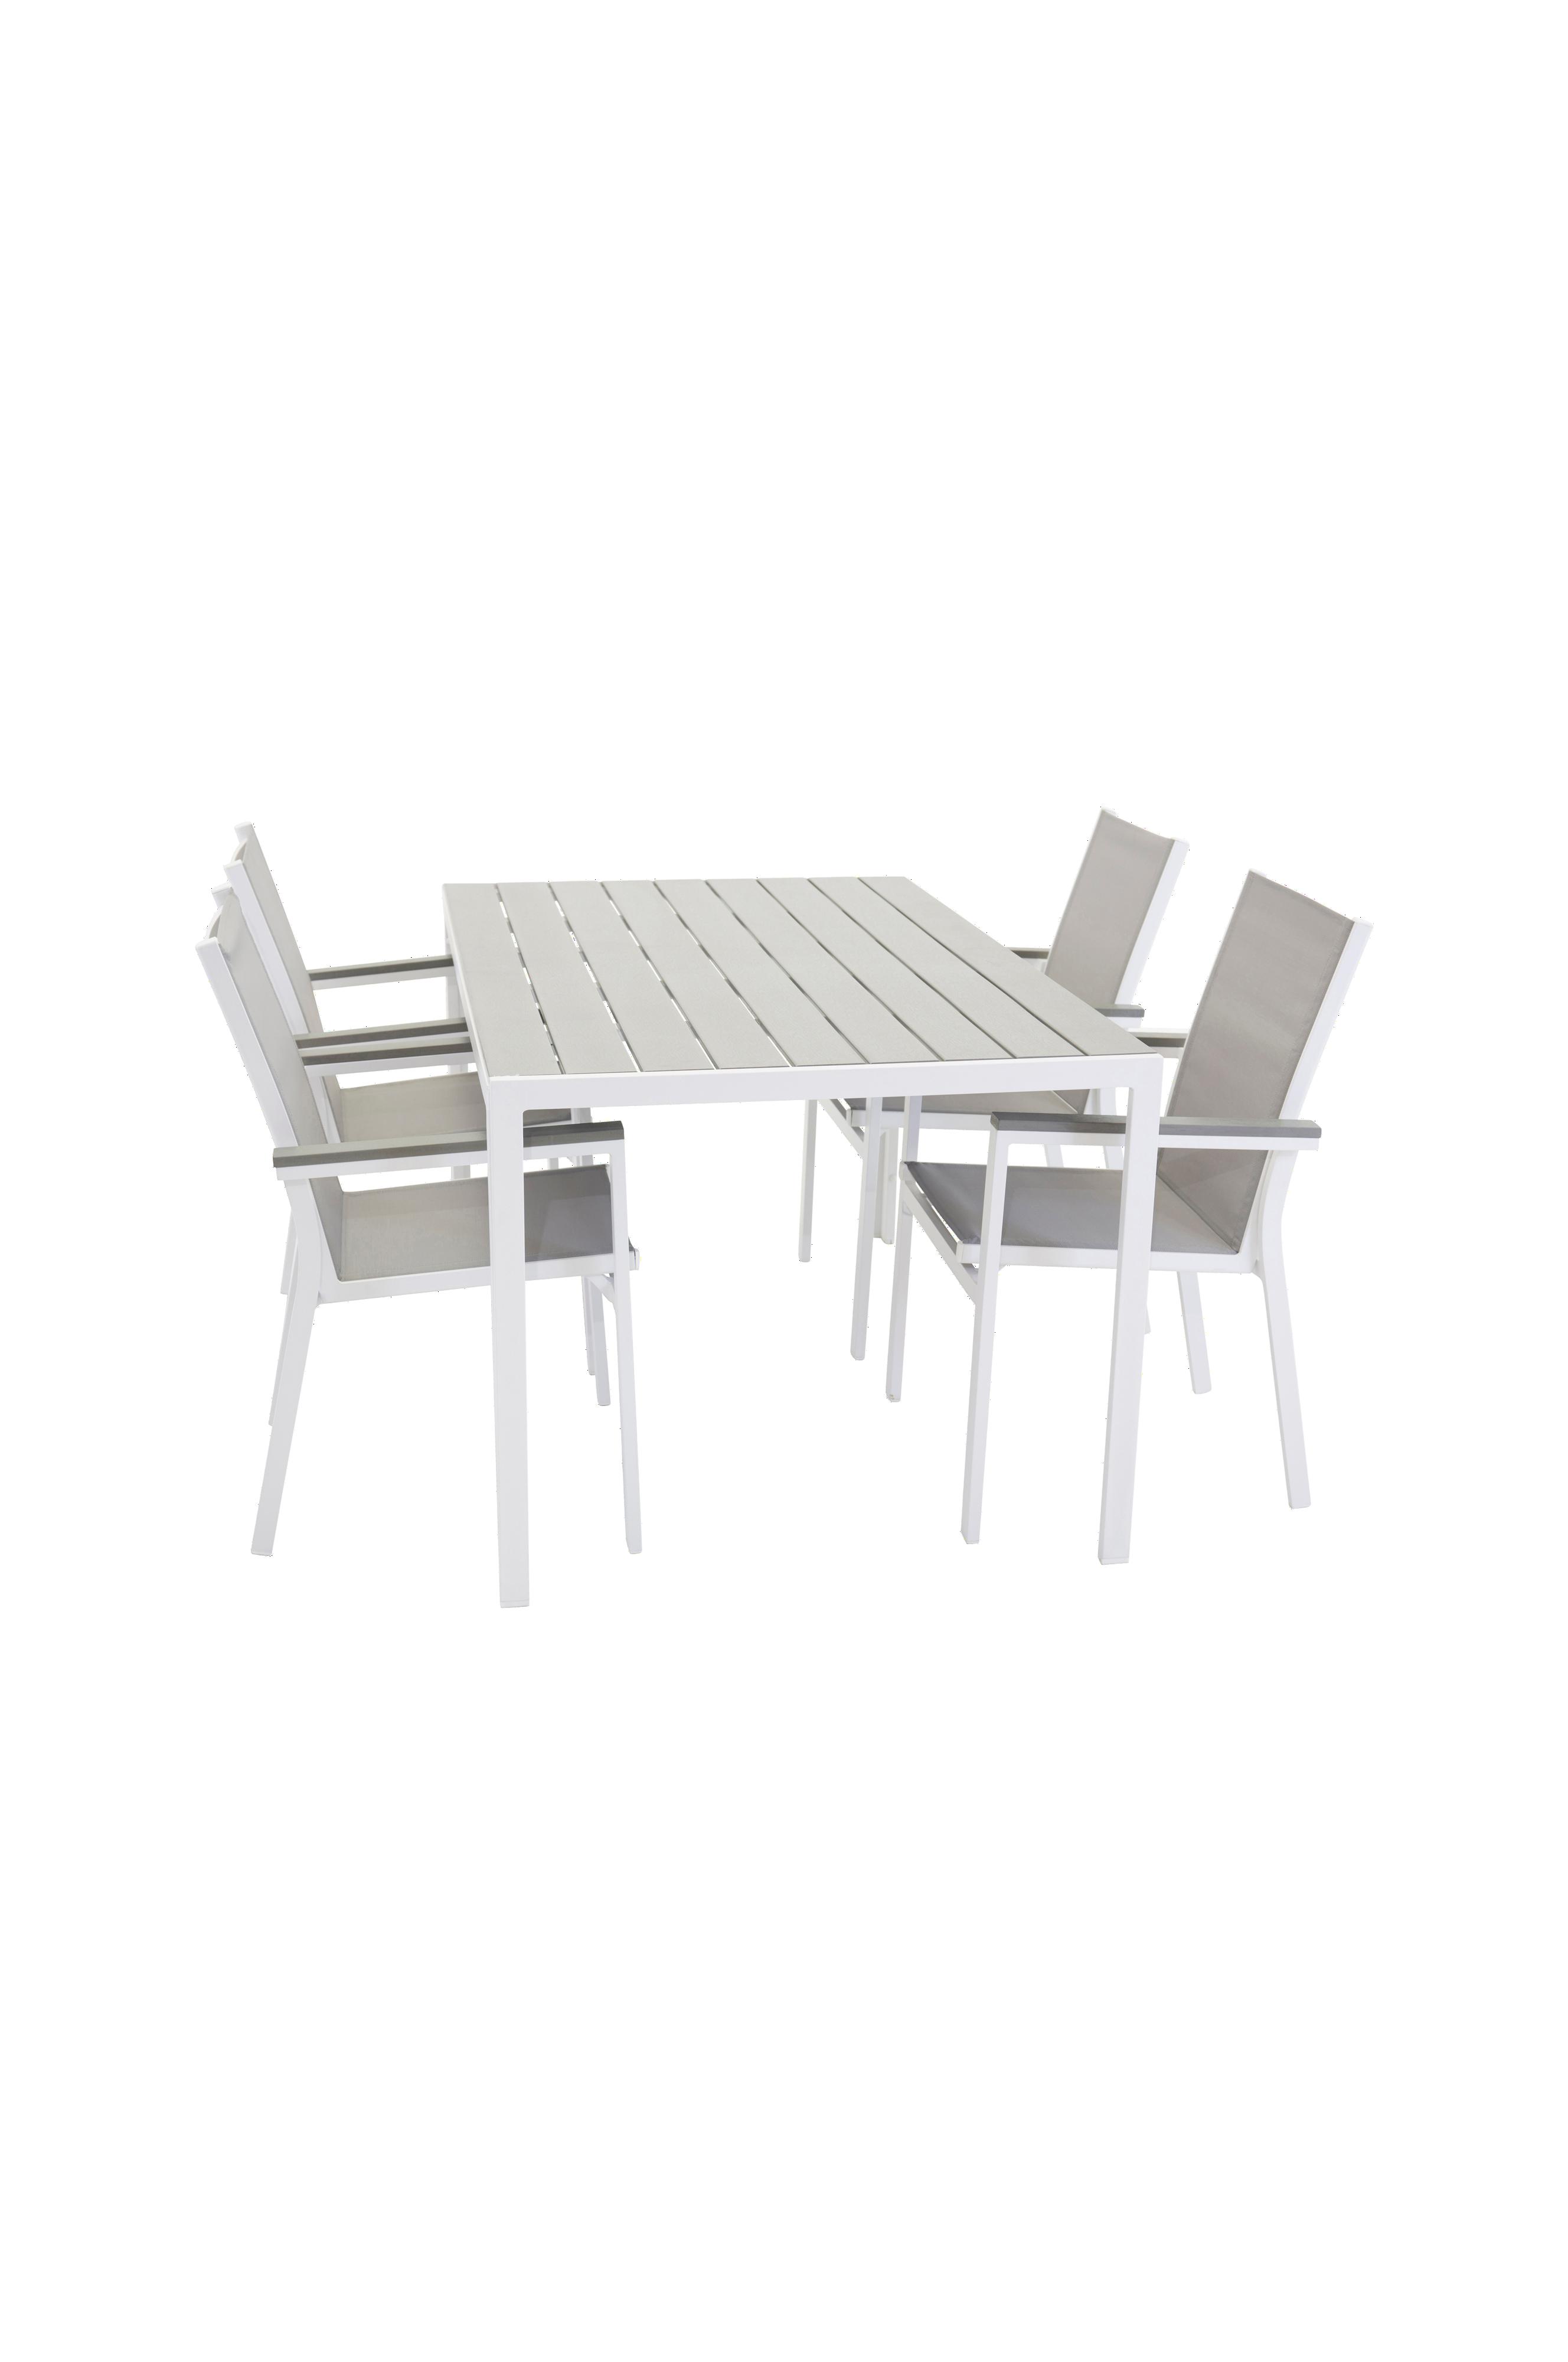 NORDFORM Spisegruppe BreakParma, 4 stoler Grå Utemøbler